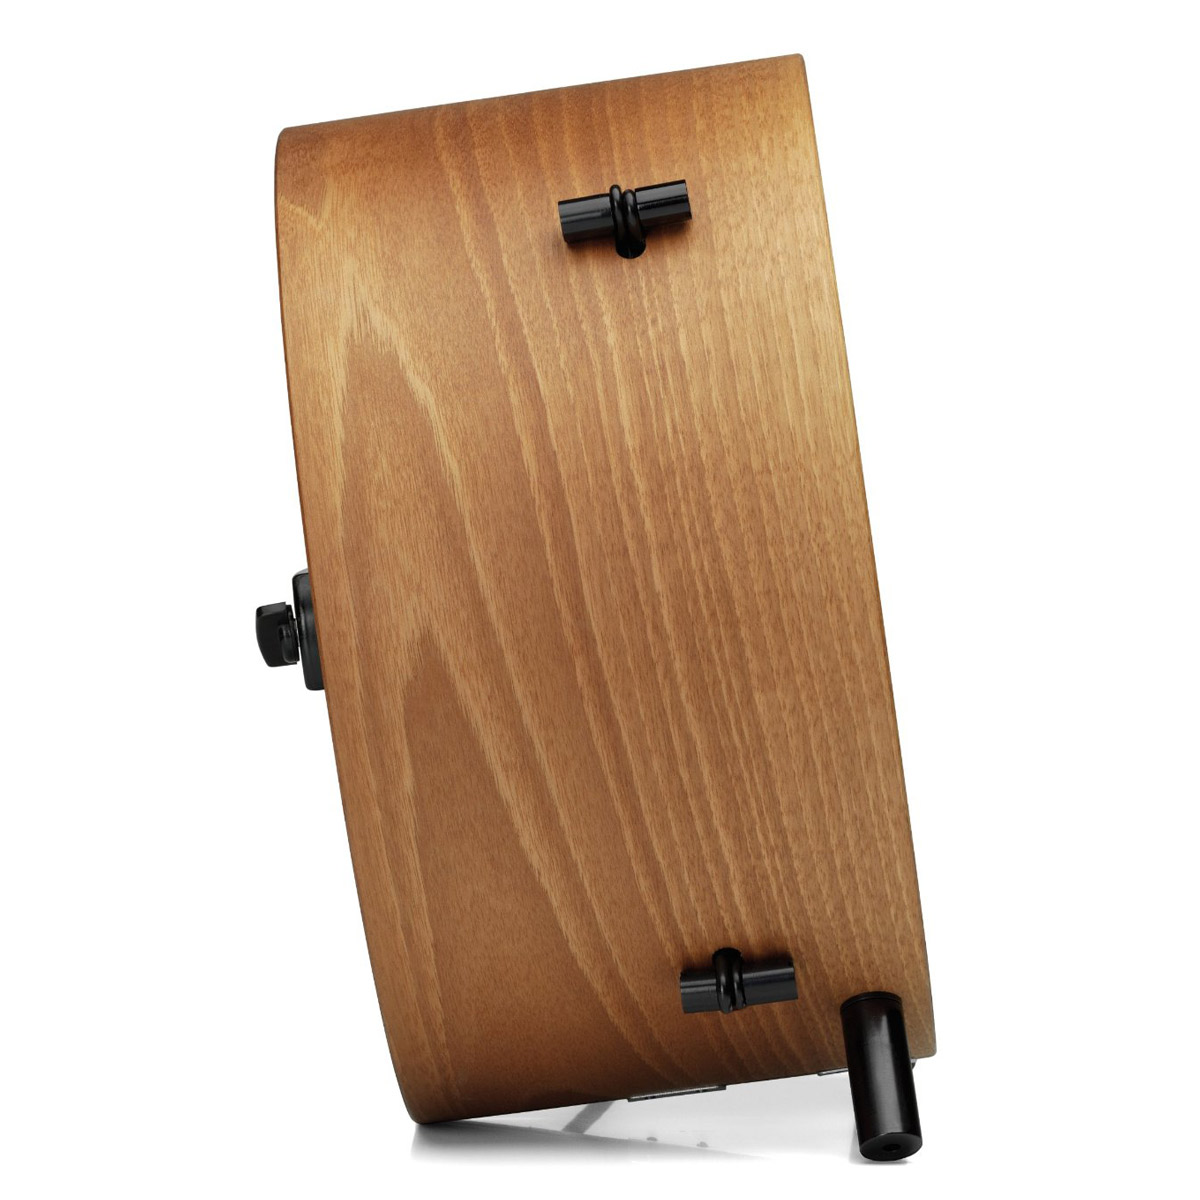 Otto Sapele Wood Fan